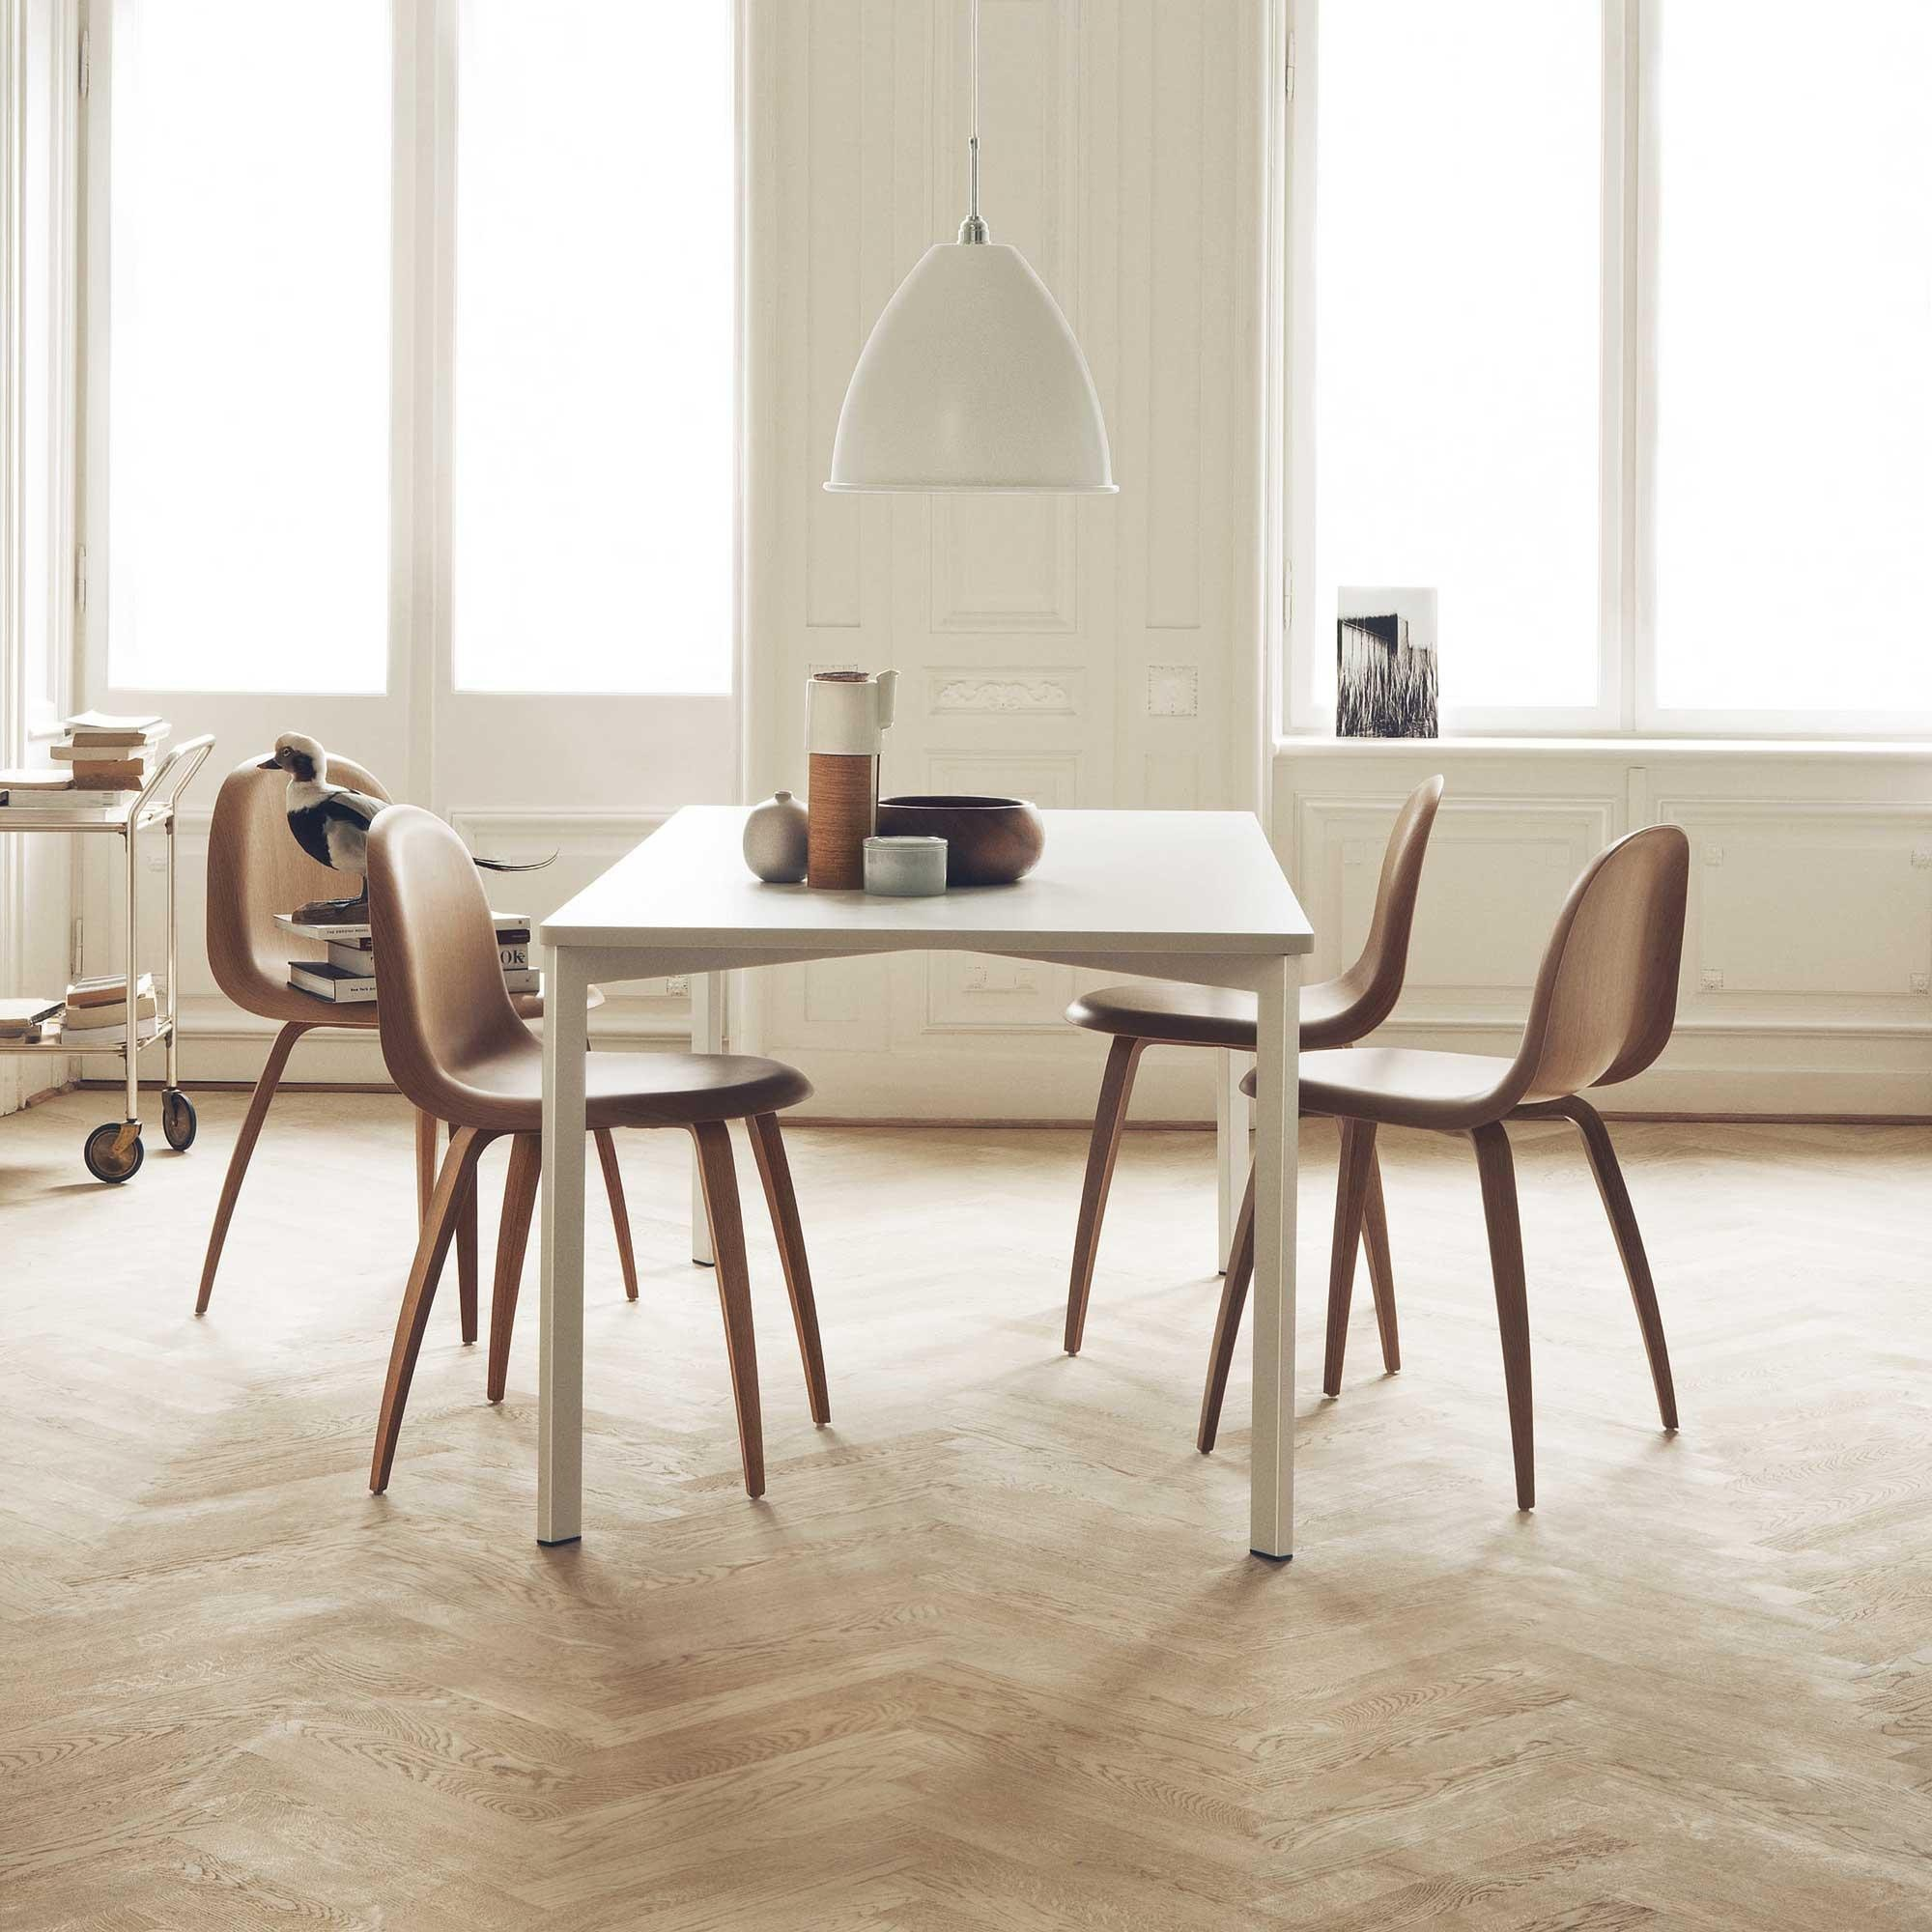 3D Dining Chair Gestell Eiche